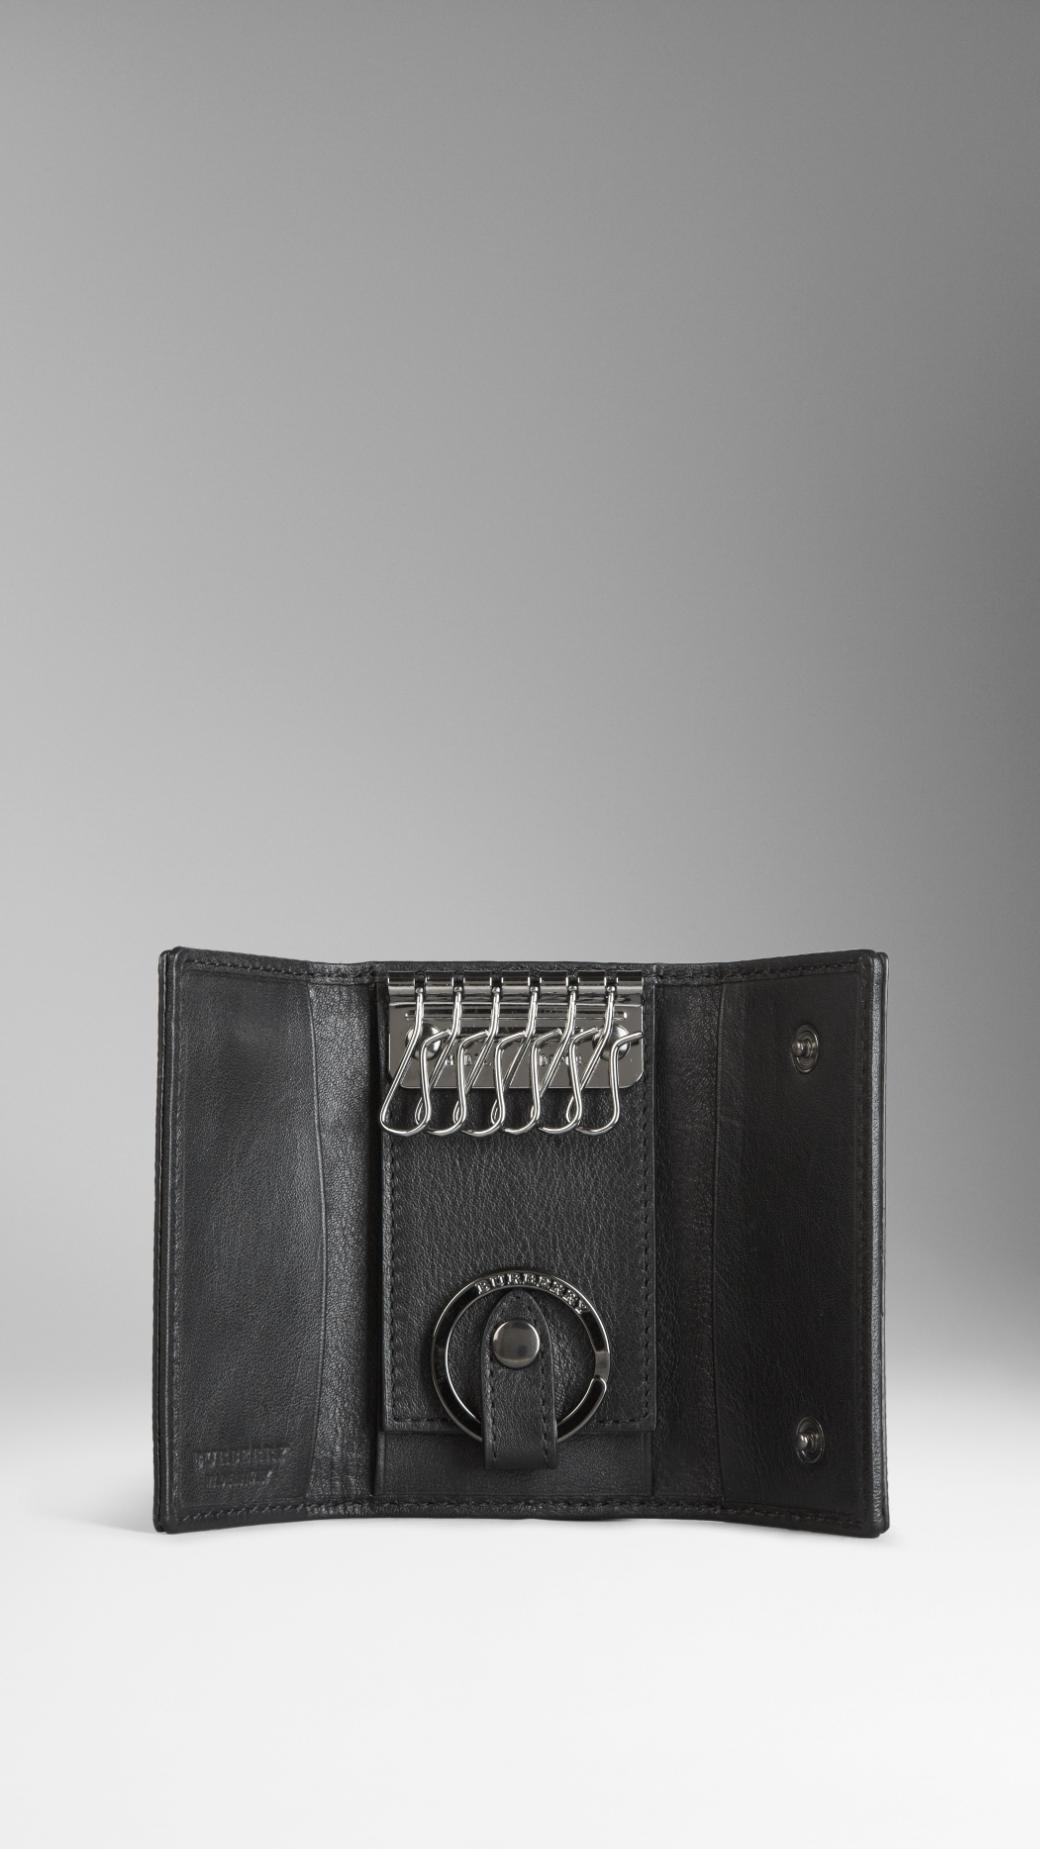 Burberry London Leather Key Case In Black For Men Lyst